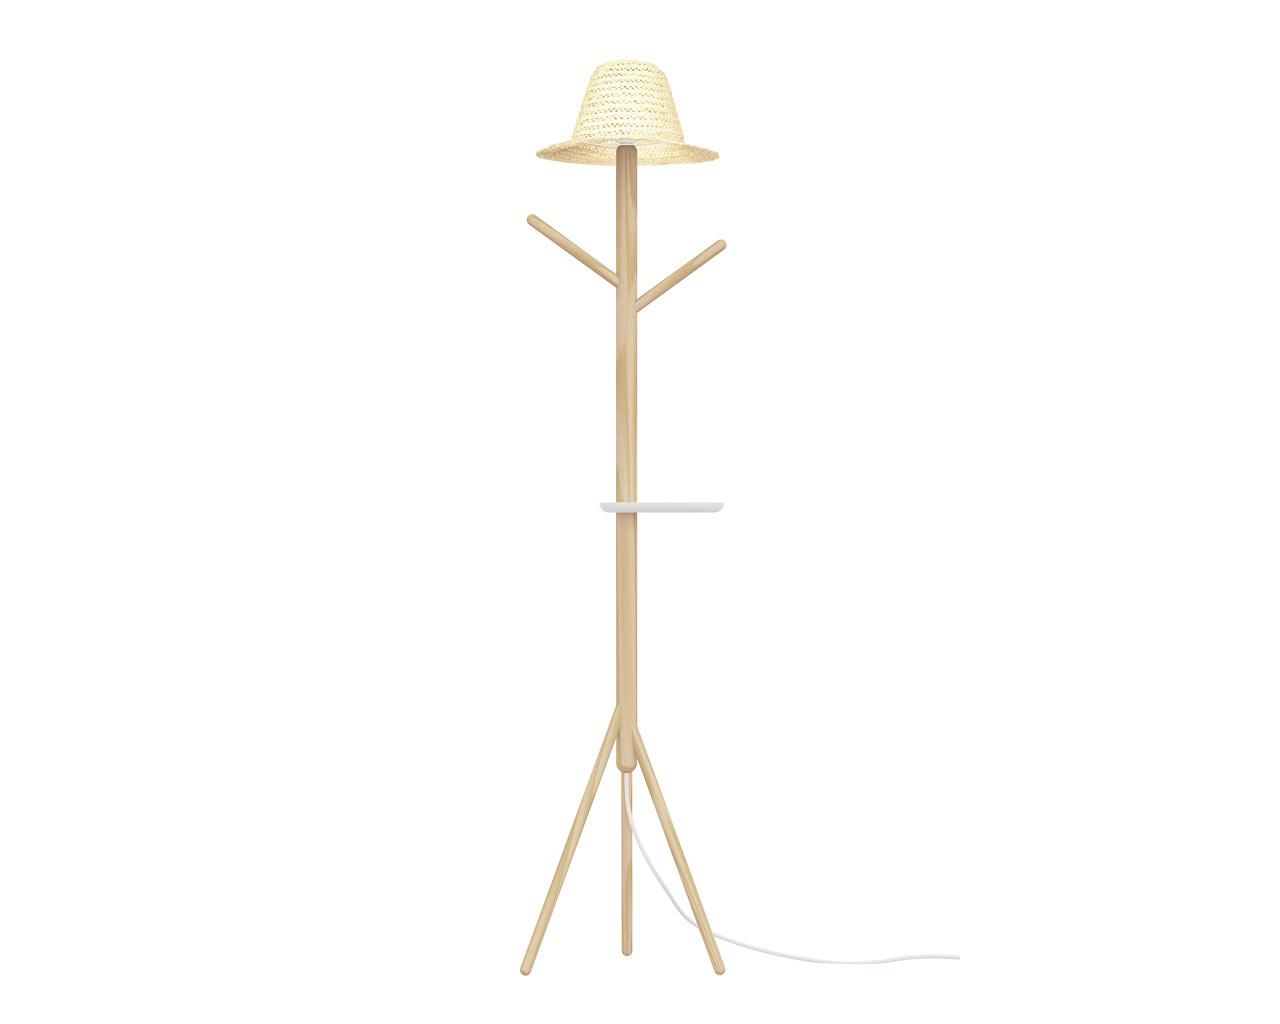 DAM-Furniture-6a-Ze-Floor-Lamp-Coat-Rack